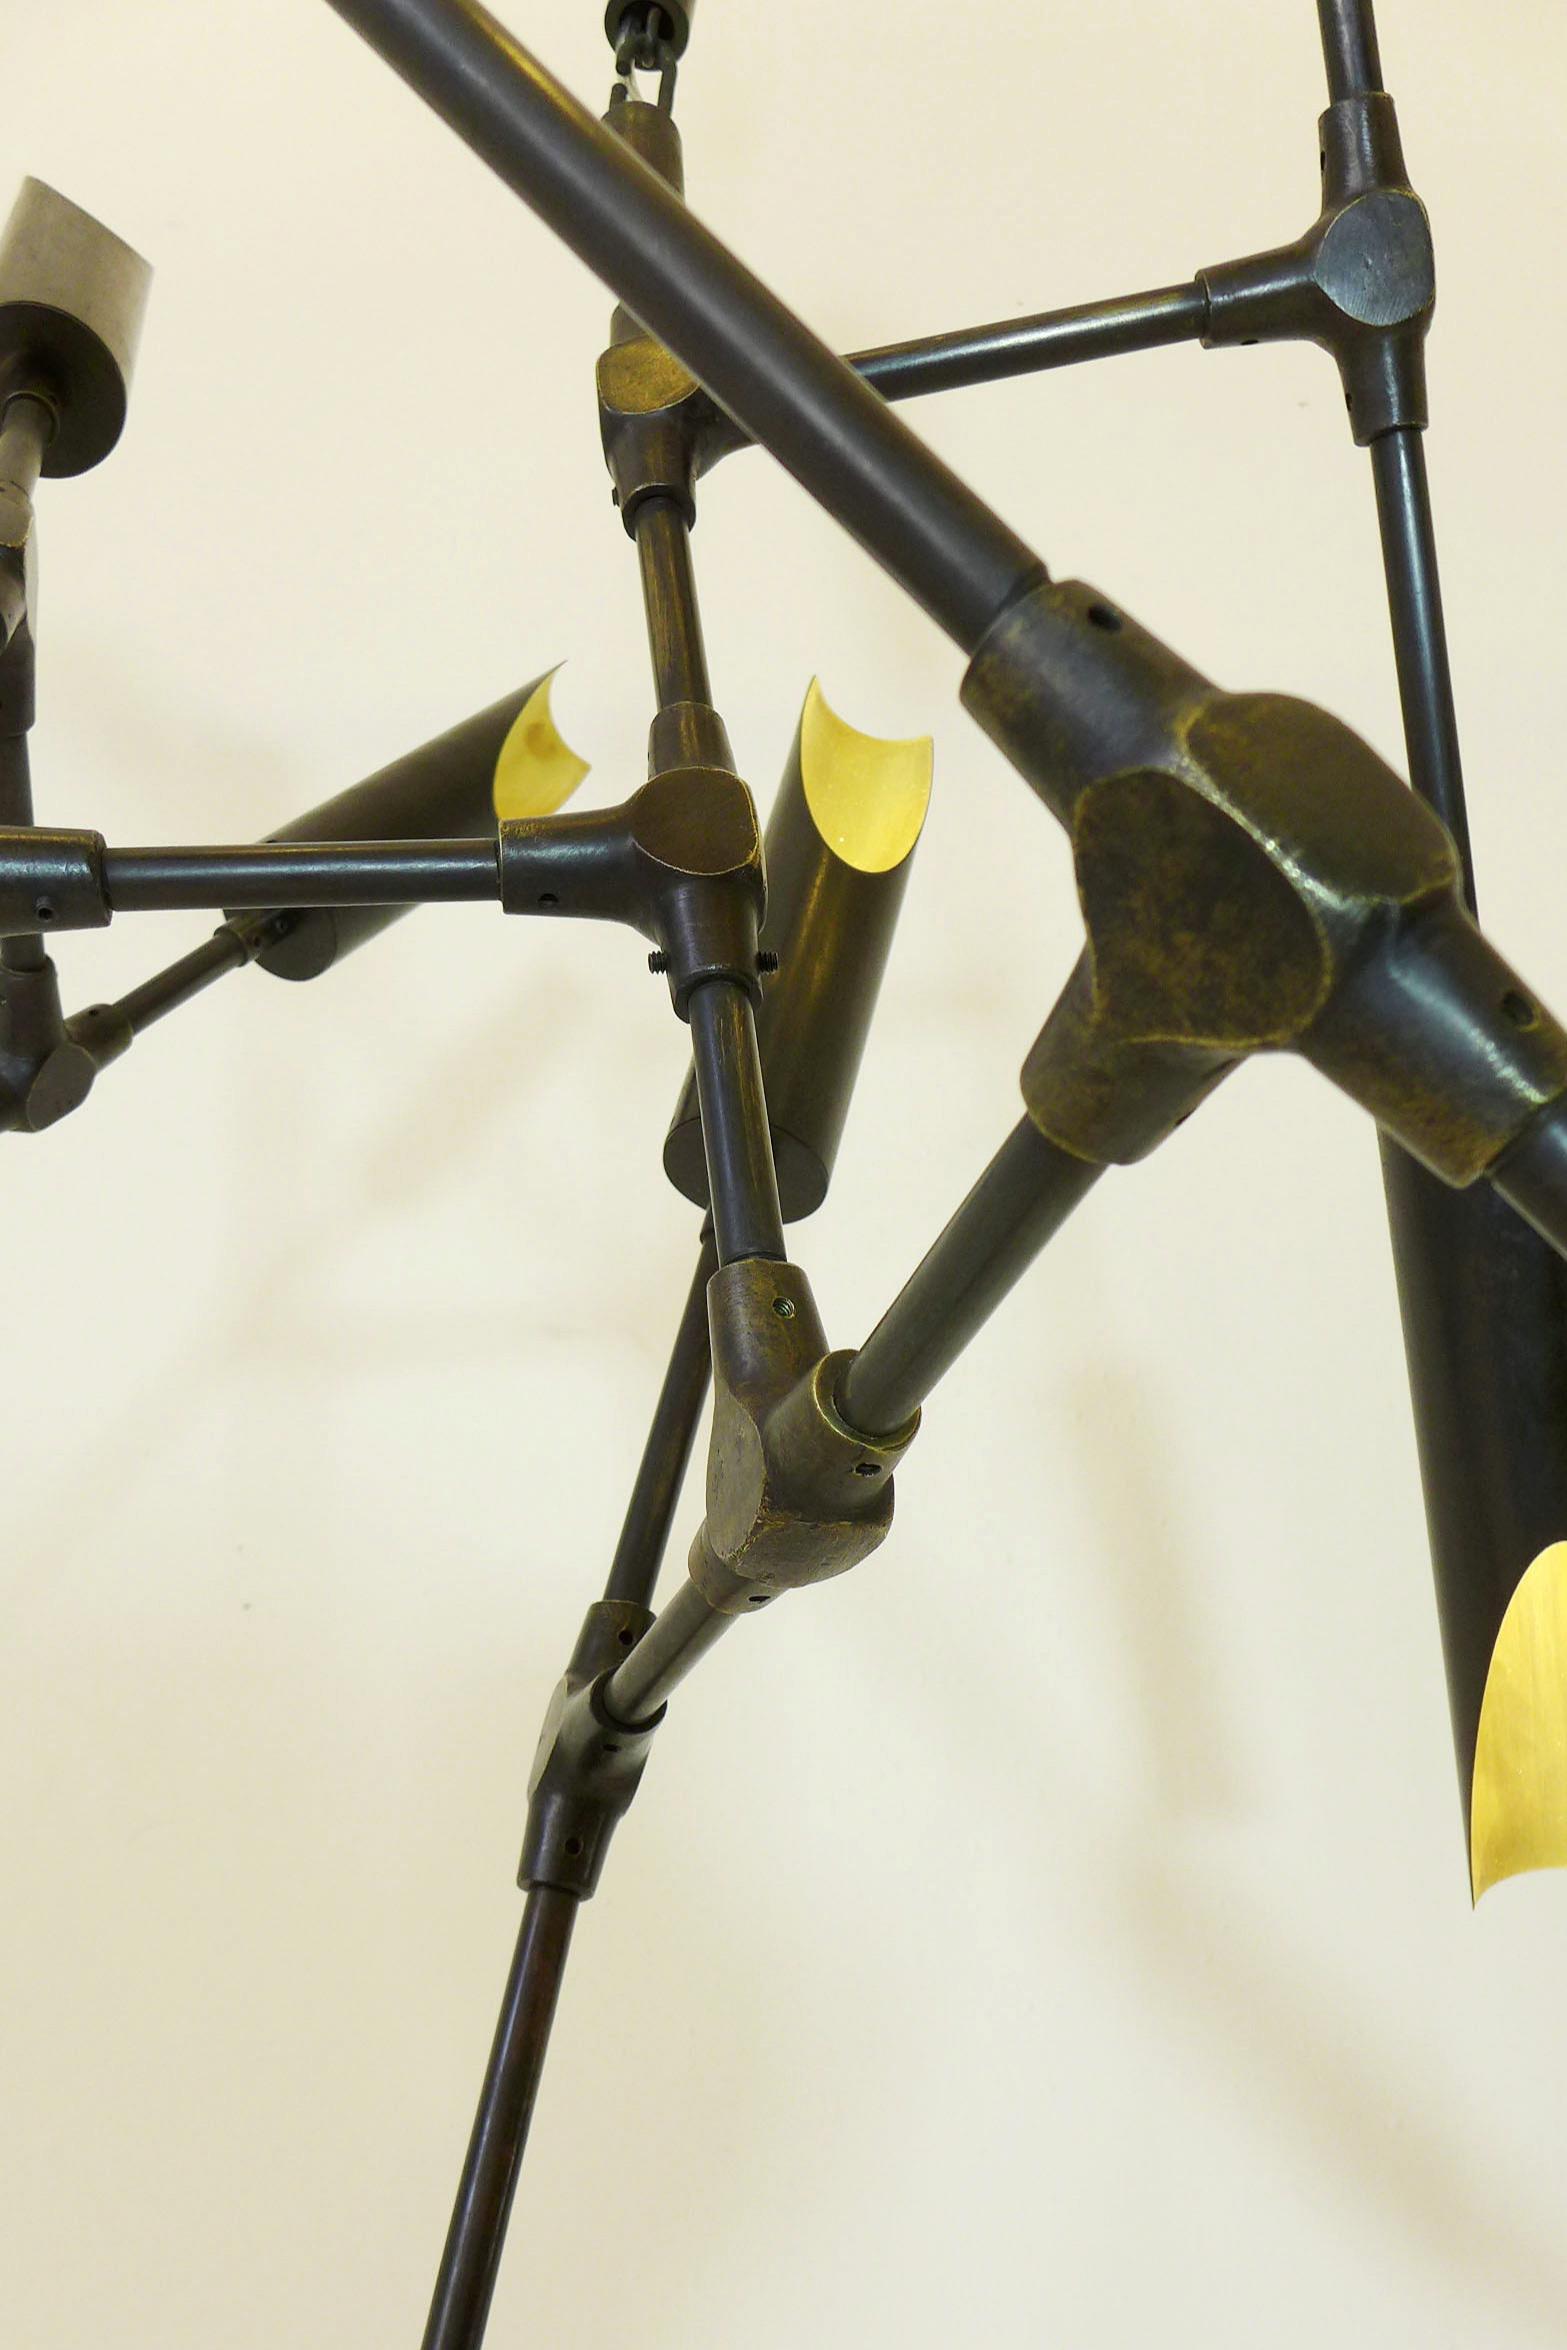 tubular-chandelier-theirry-jeannot-brass-details-marion-friedmann-gallery.jpg